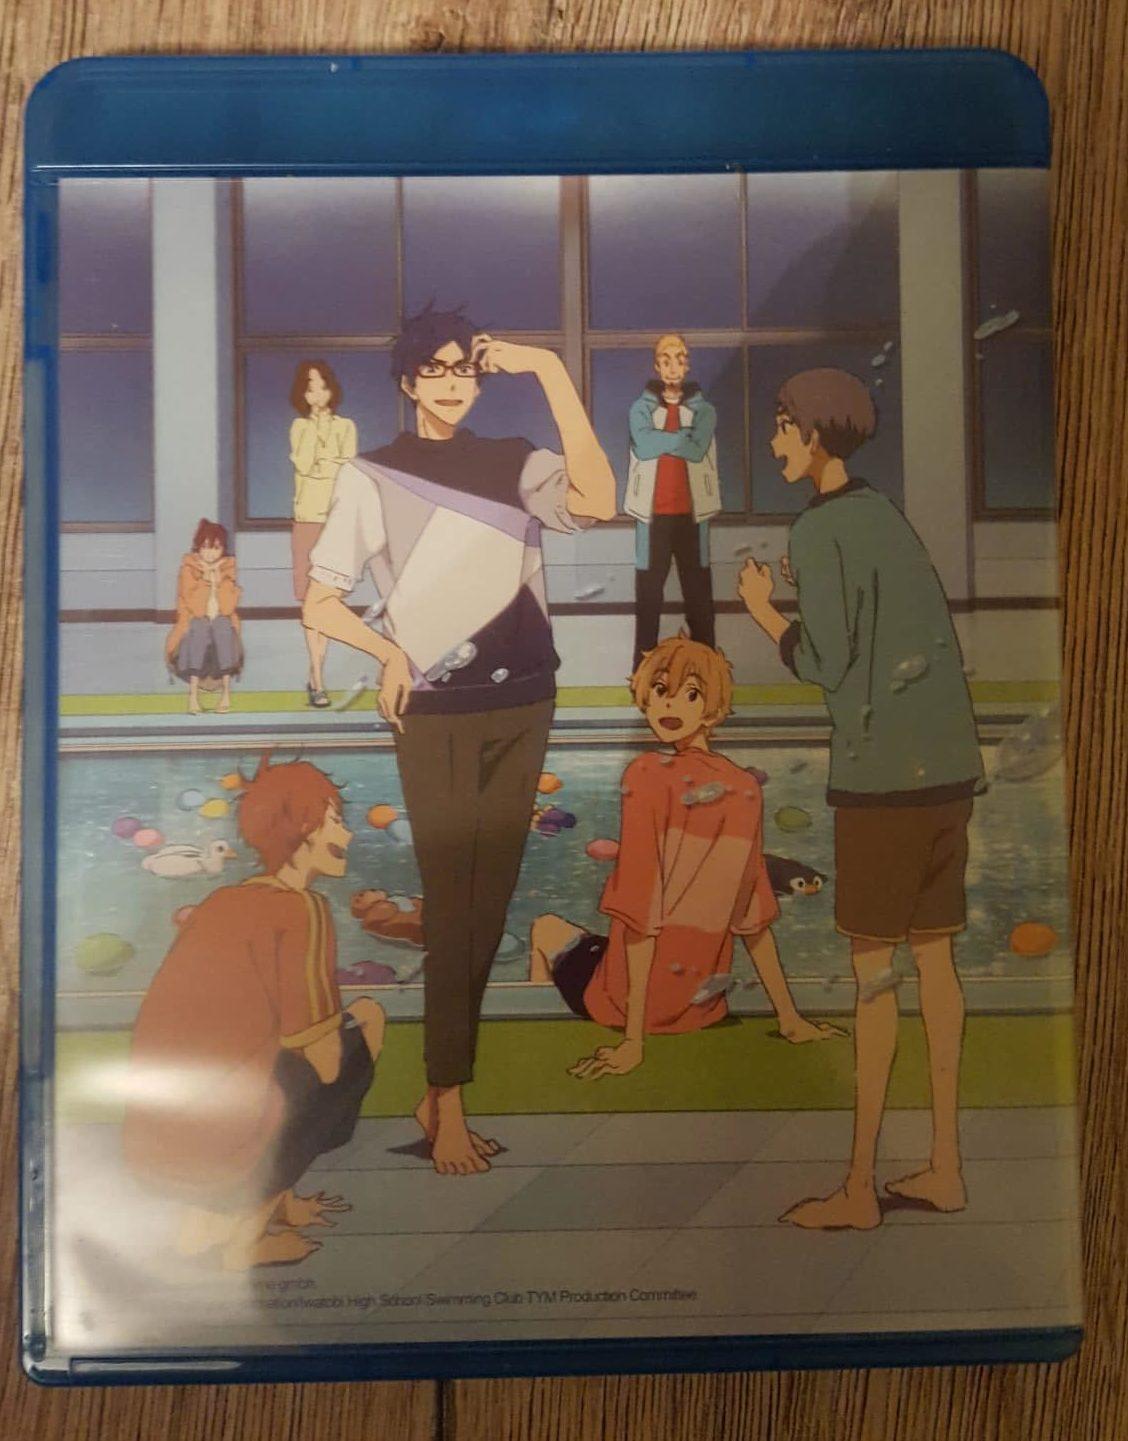 Review Free Take Your Marks Blu Ray Animenachrichten